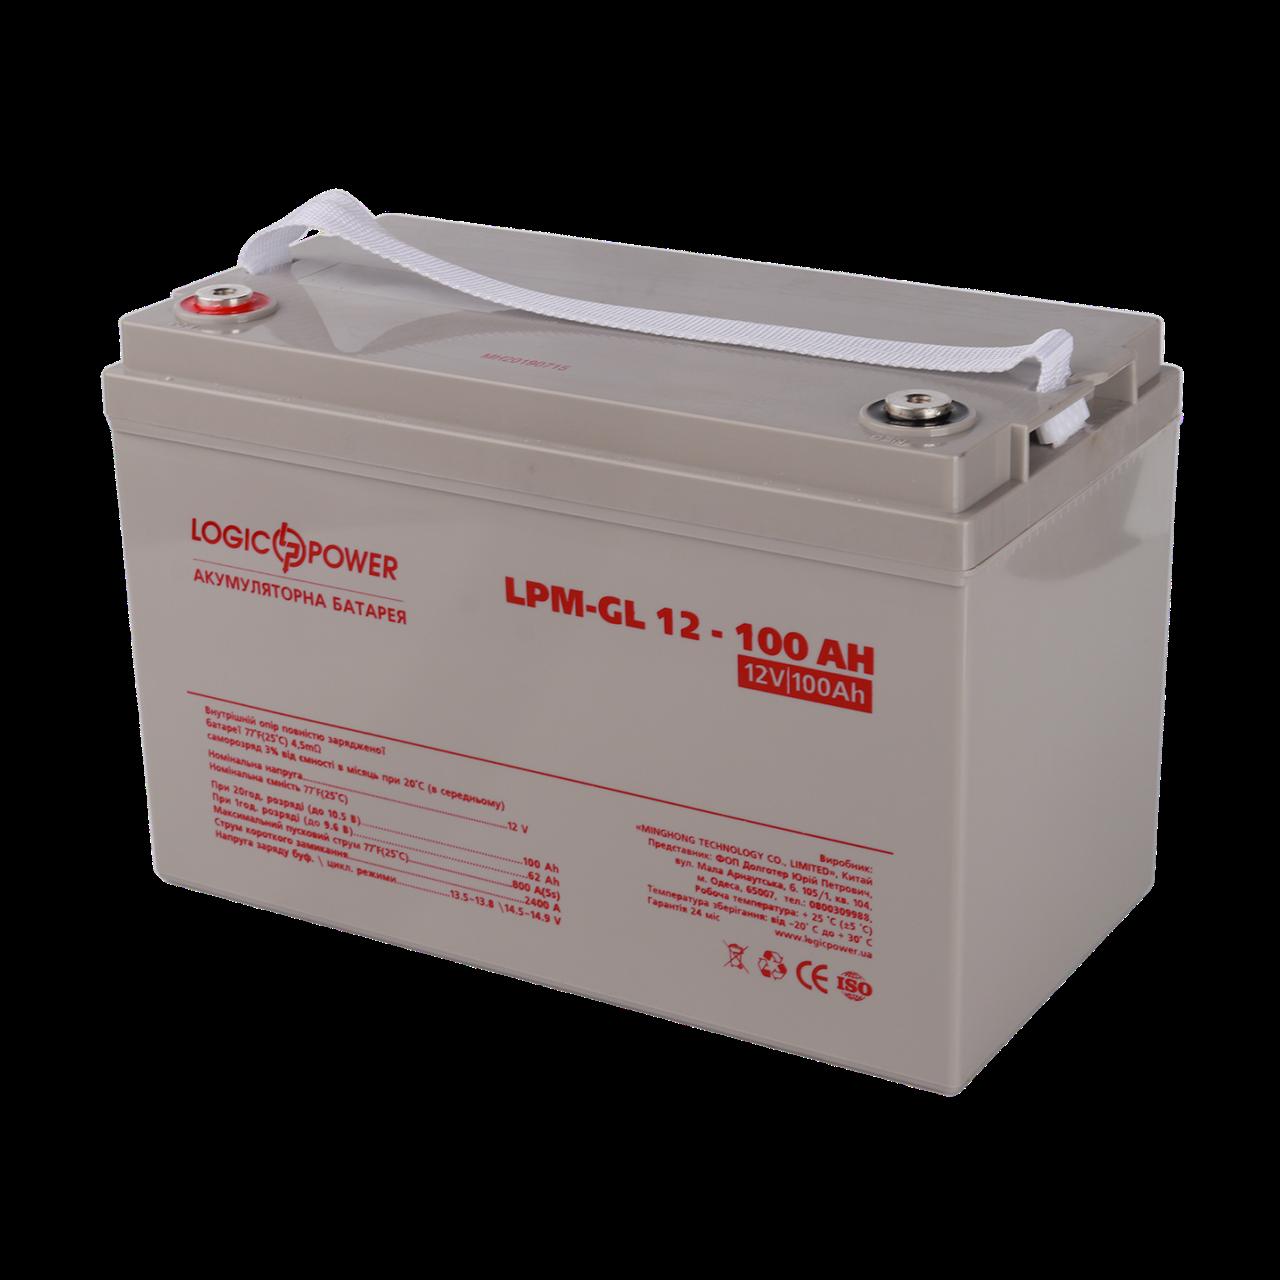 Акумулятор гелевий LogicPower LPM-GL 12 - 100 AH